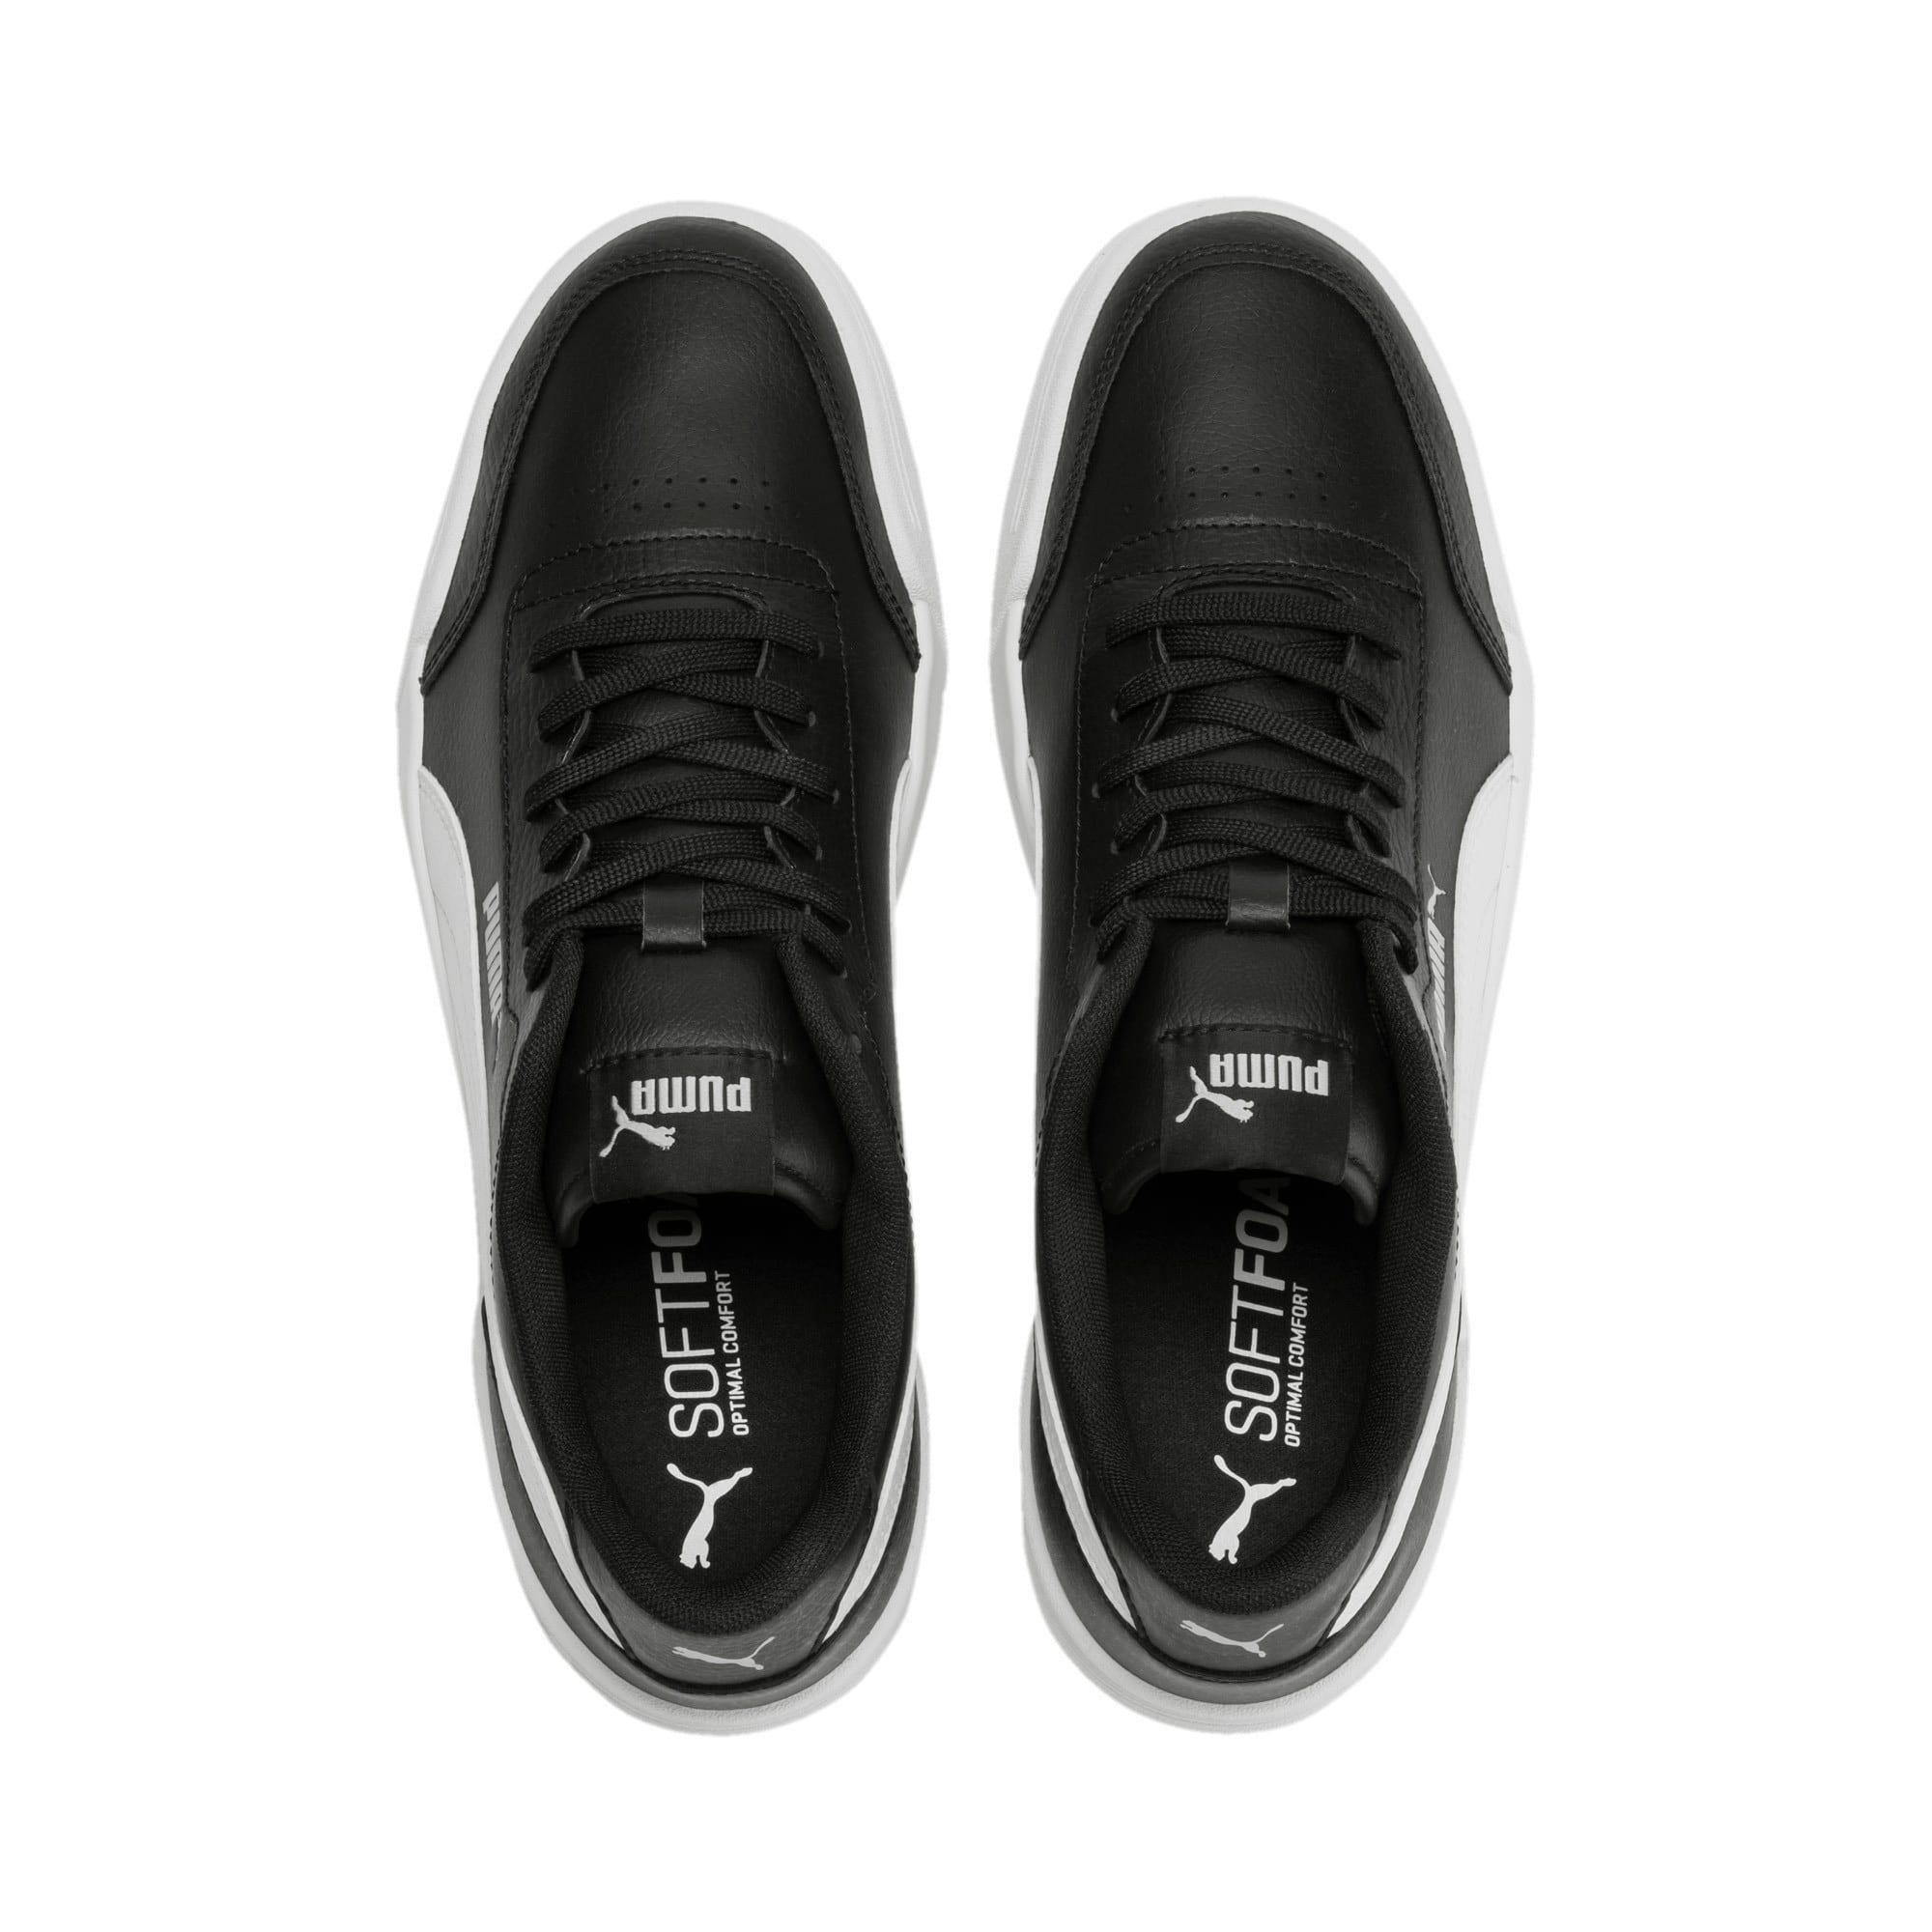 Thumbnail 7 of Caracal Sneakers, Puma Black-Puma White, medium